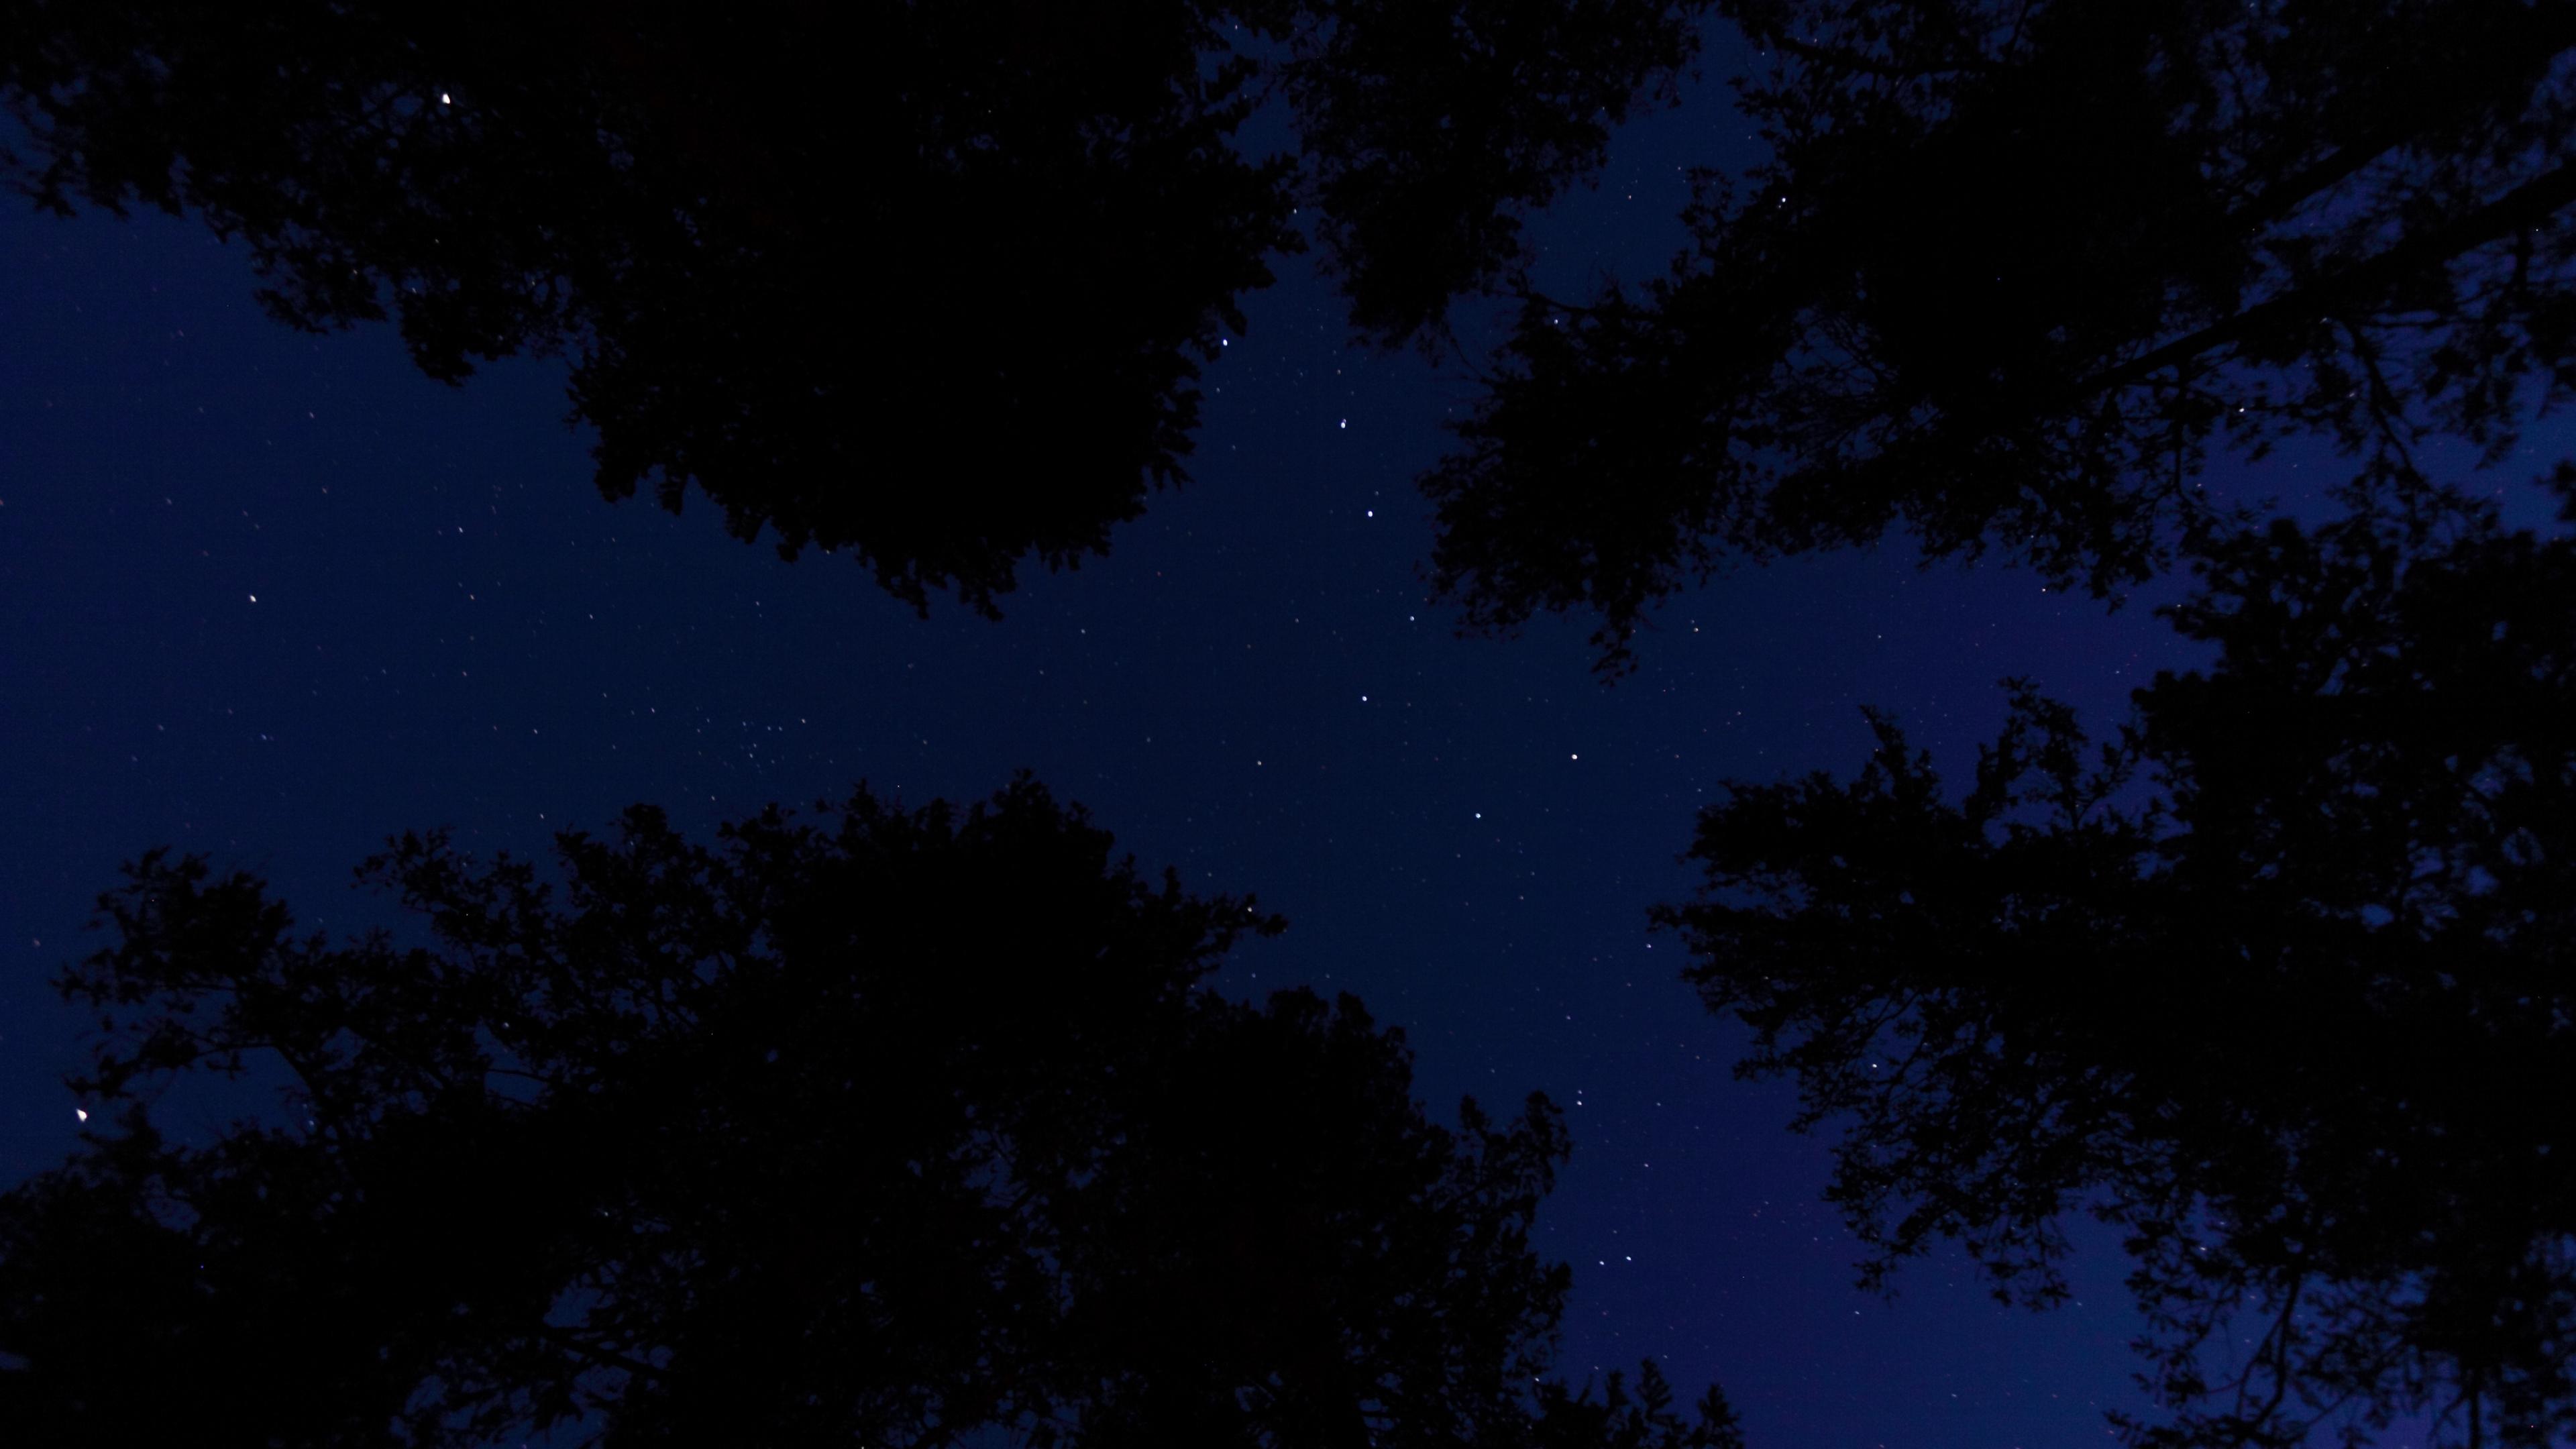 starry sky trees night bottom view 4k 1540576105 - starry sky, trees, night, bottom view 4k - Trees, starry sky, Night